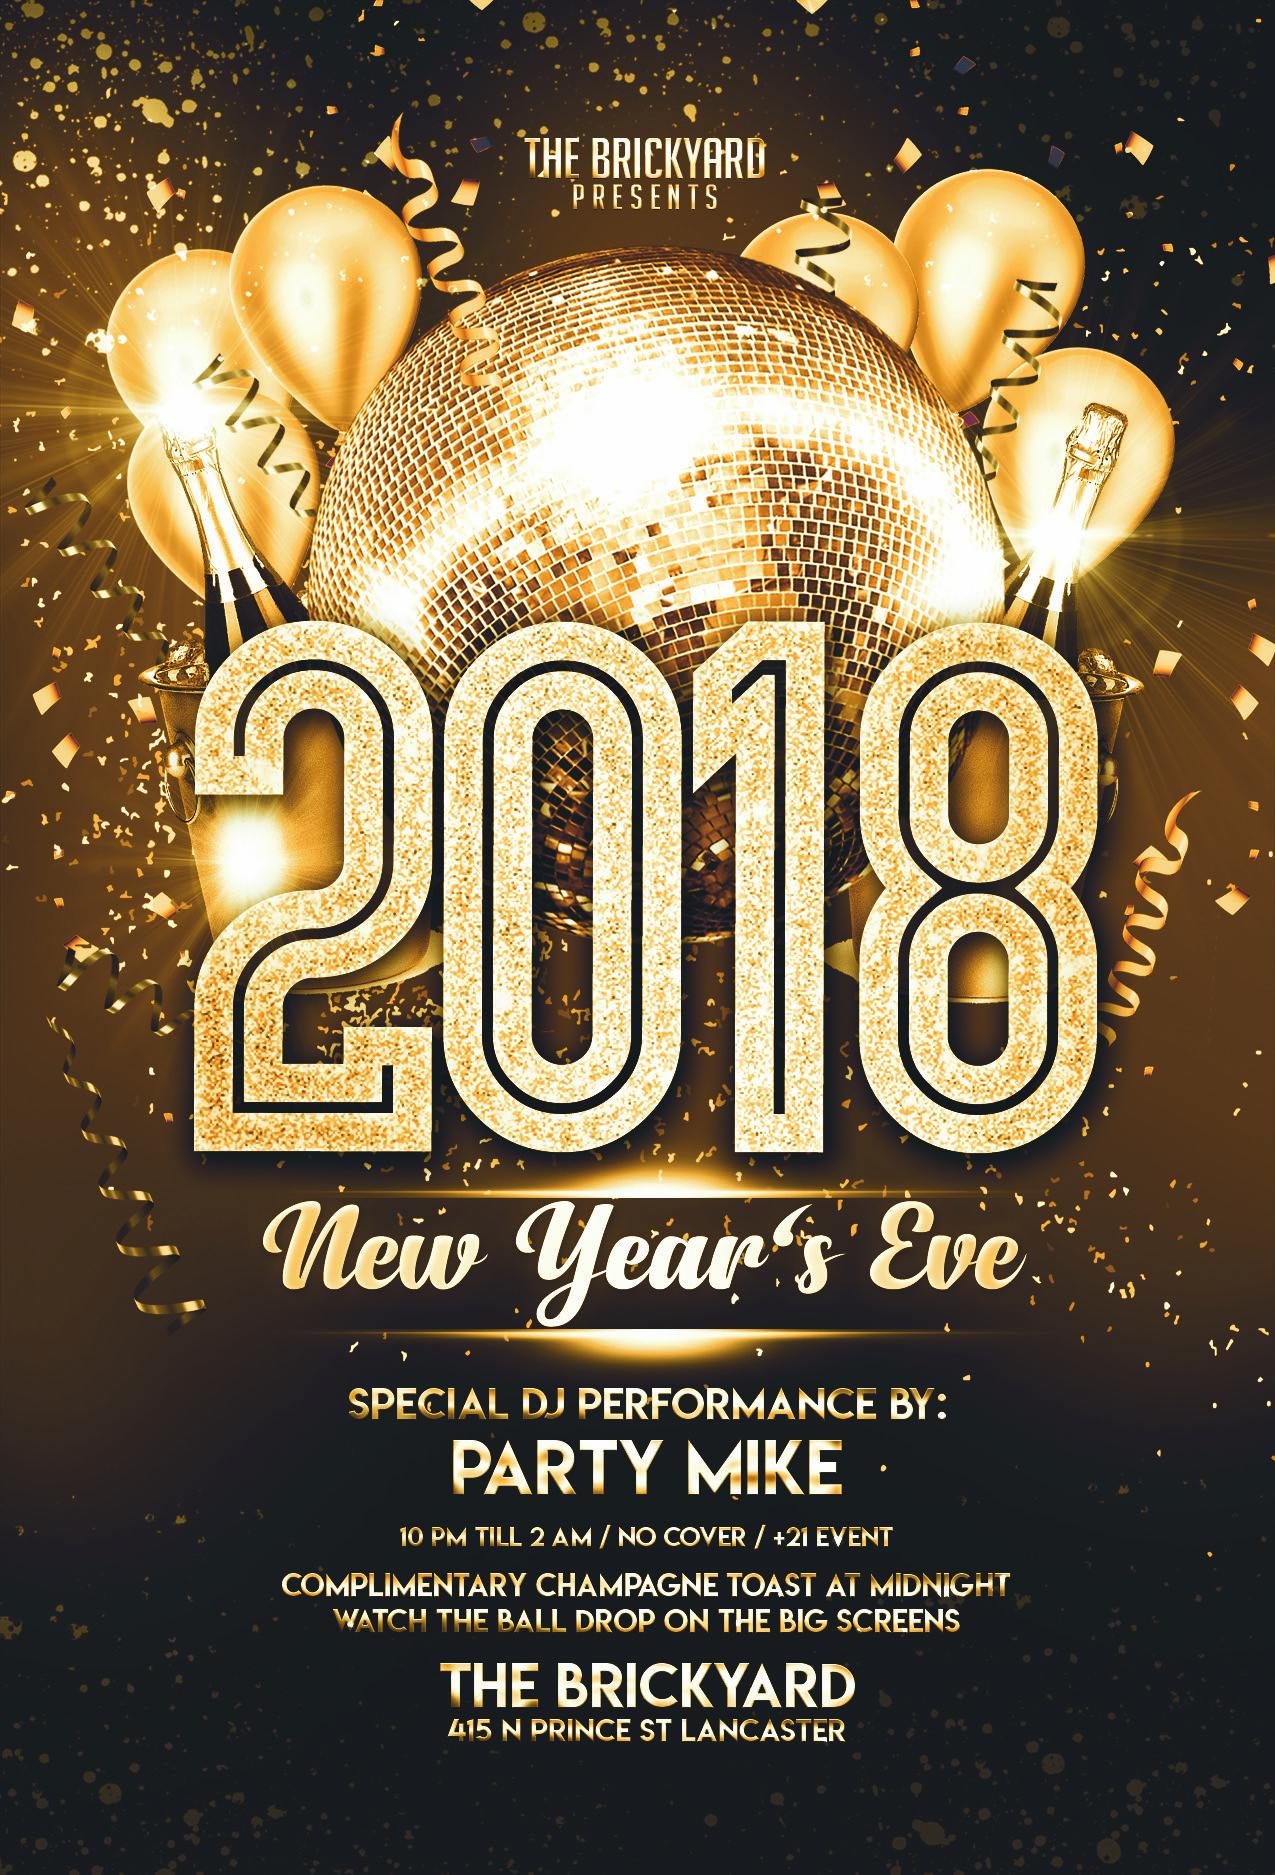 2018 new year's eve.JPG